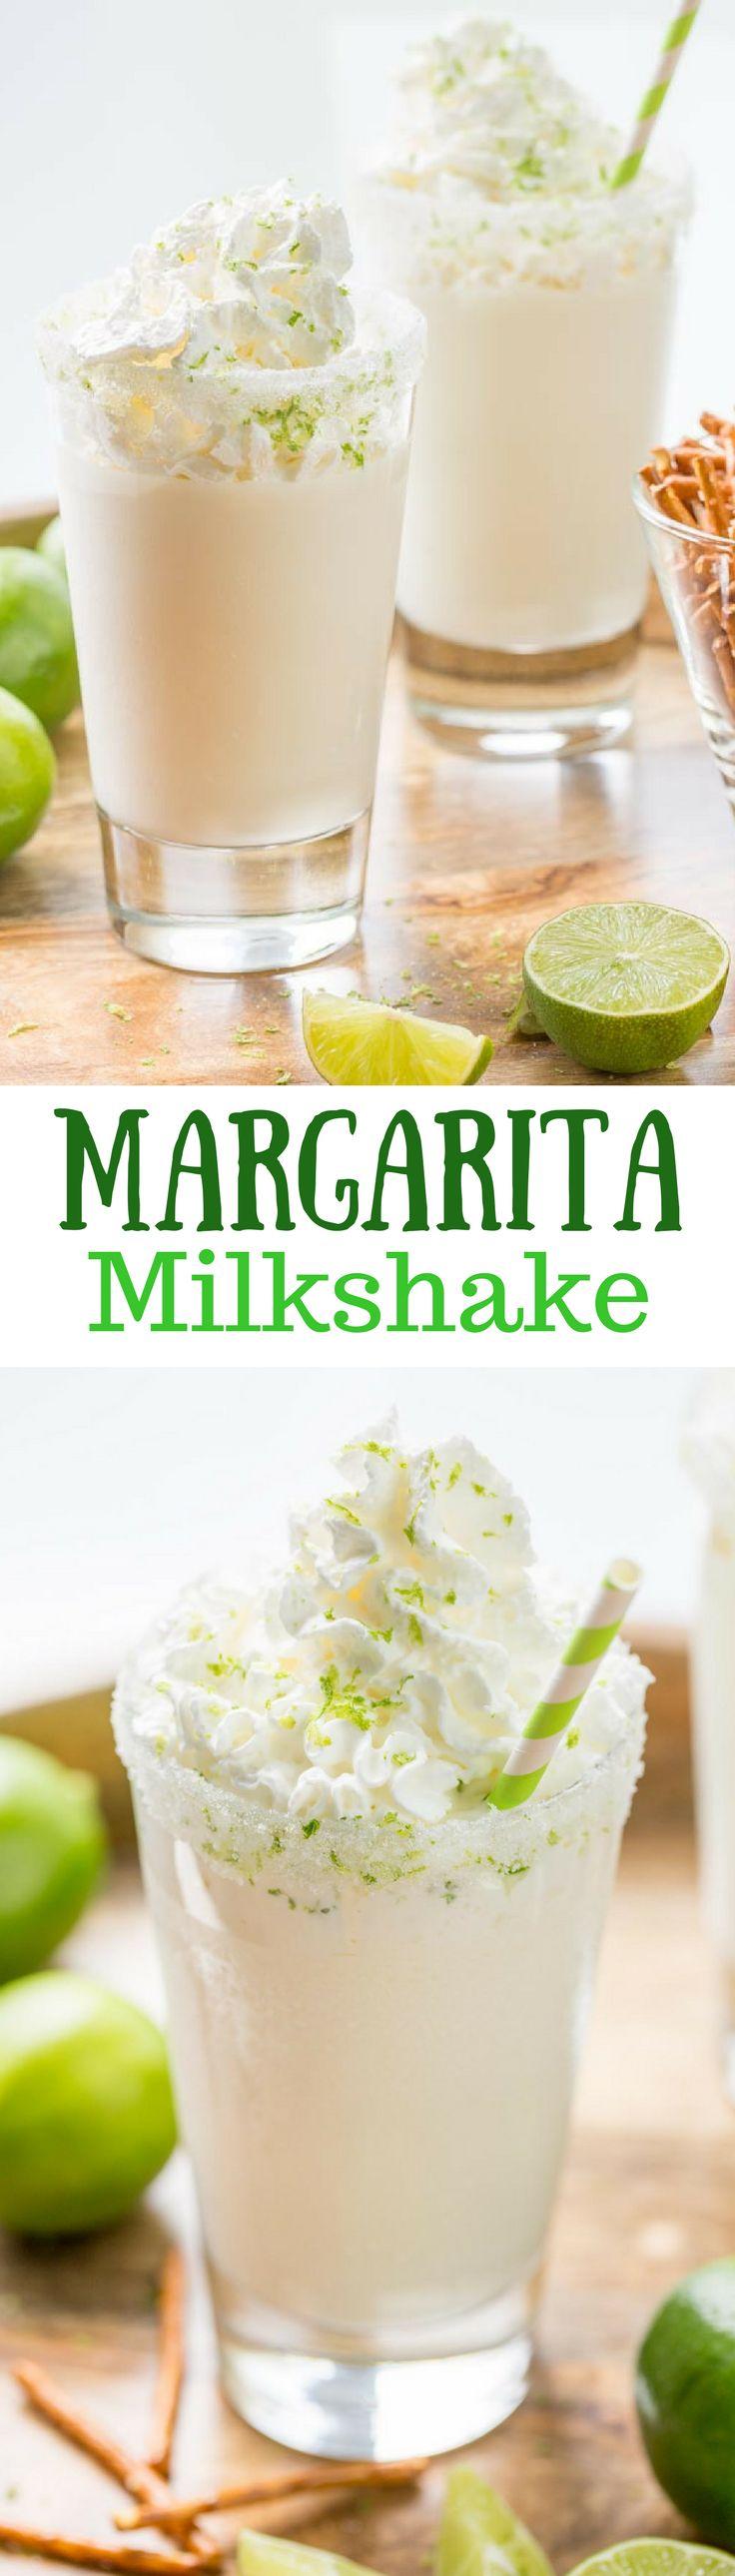 Creamy Margarita Milkshake